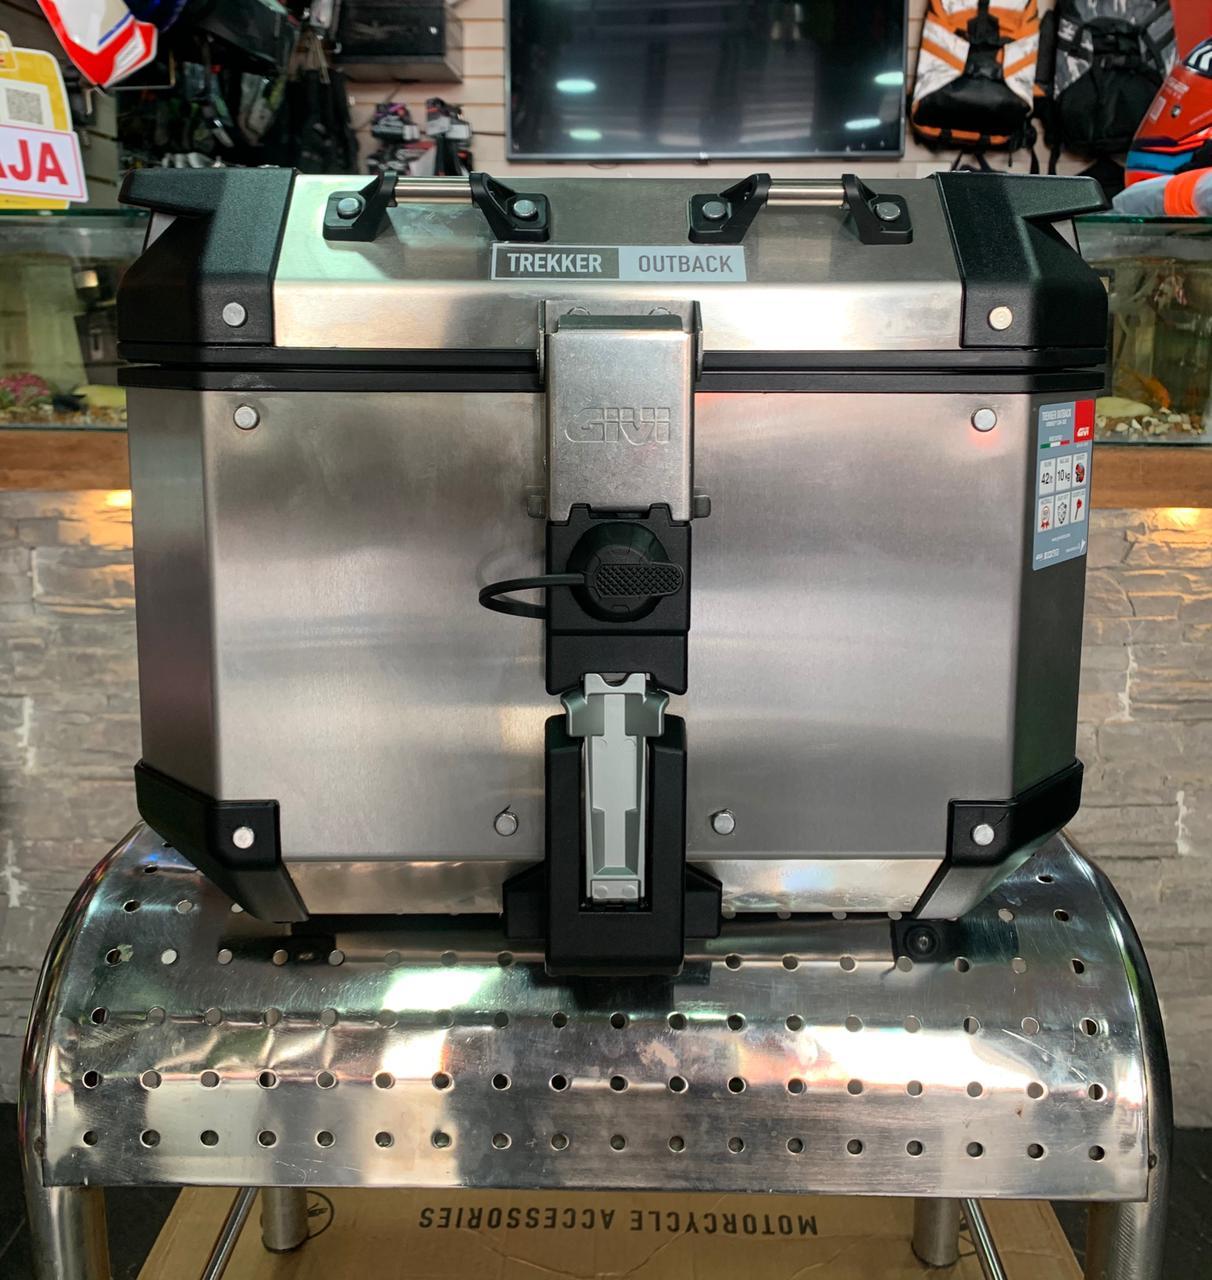 Maletero / Baul Givi Trekker Outback de 42 litros Metalico / aluminio - Adrian Store